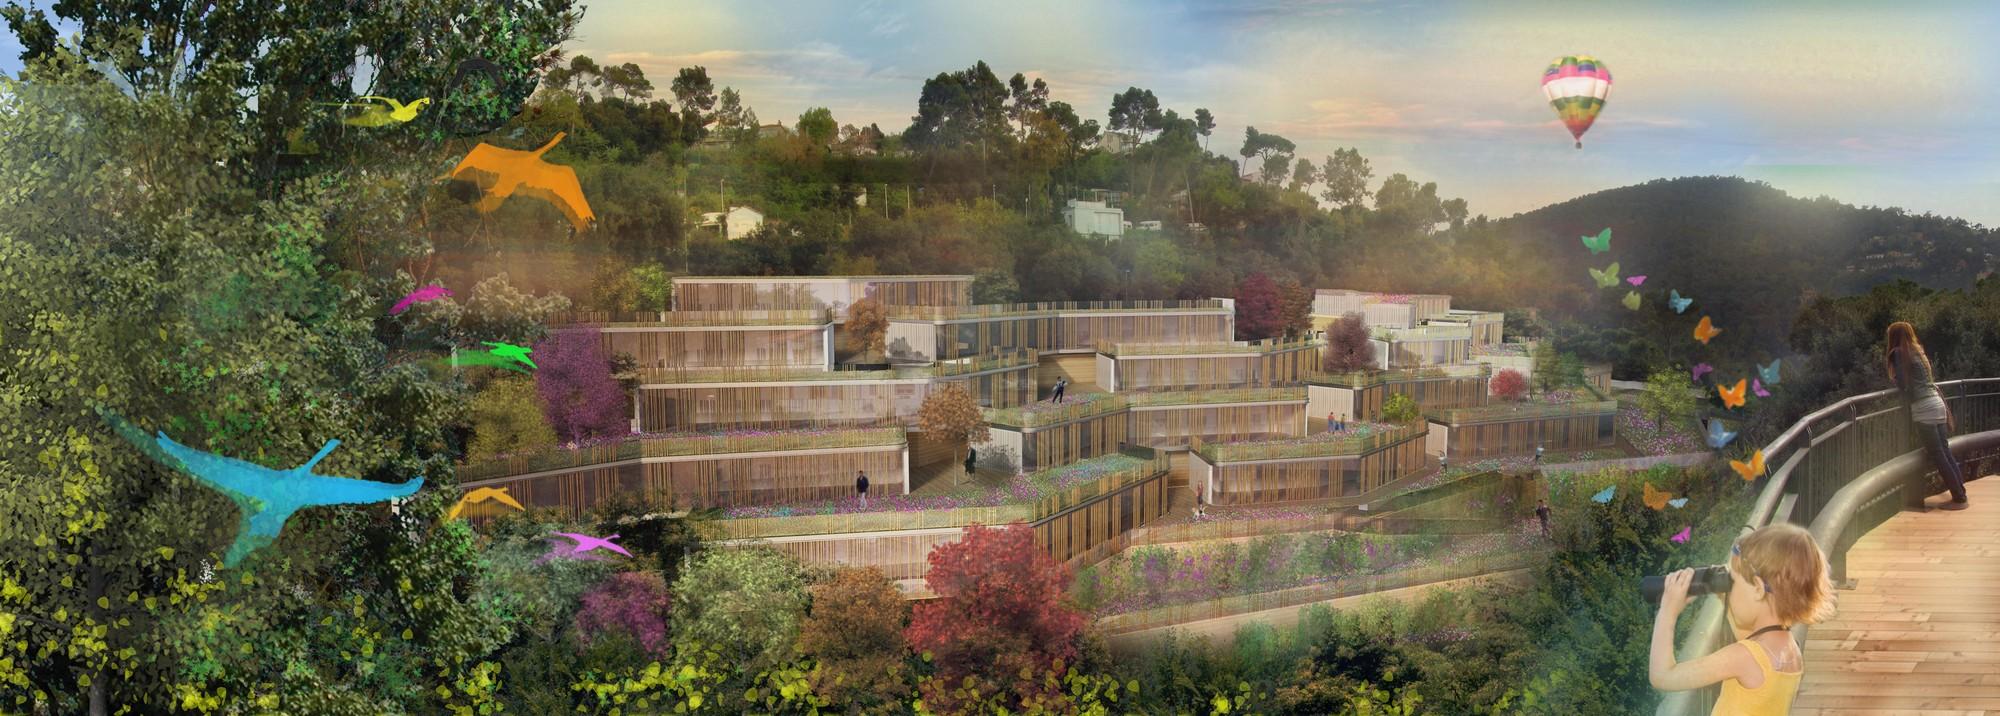 Les Portes del Collserola / Nabito Architects + Guausa y Raveaux + Actar Arquitectura, Cortesia de Nabito Architects + Actar Arquitectura